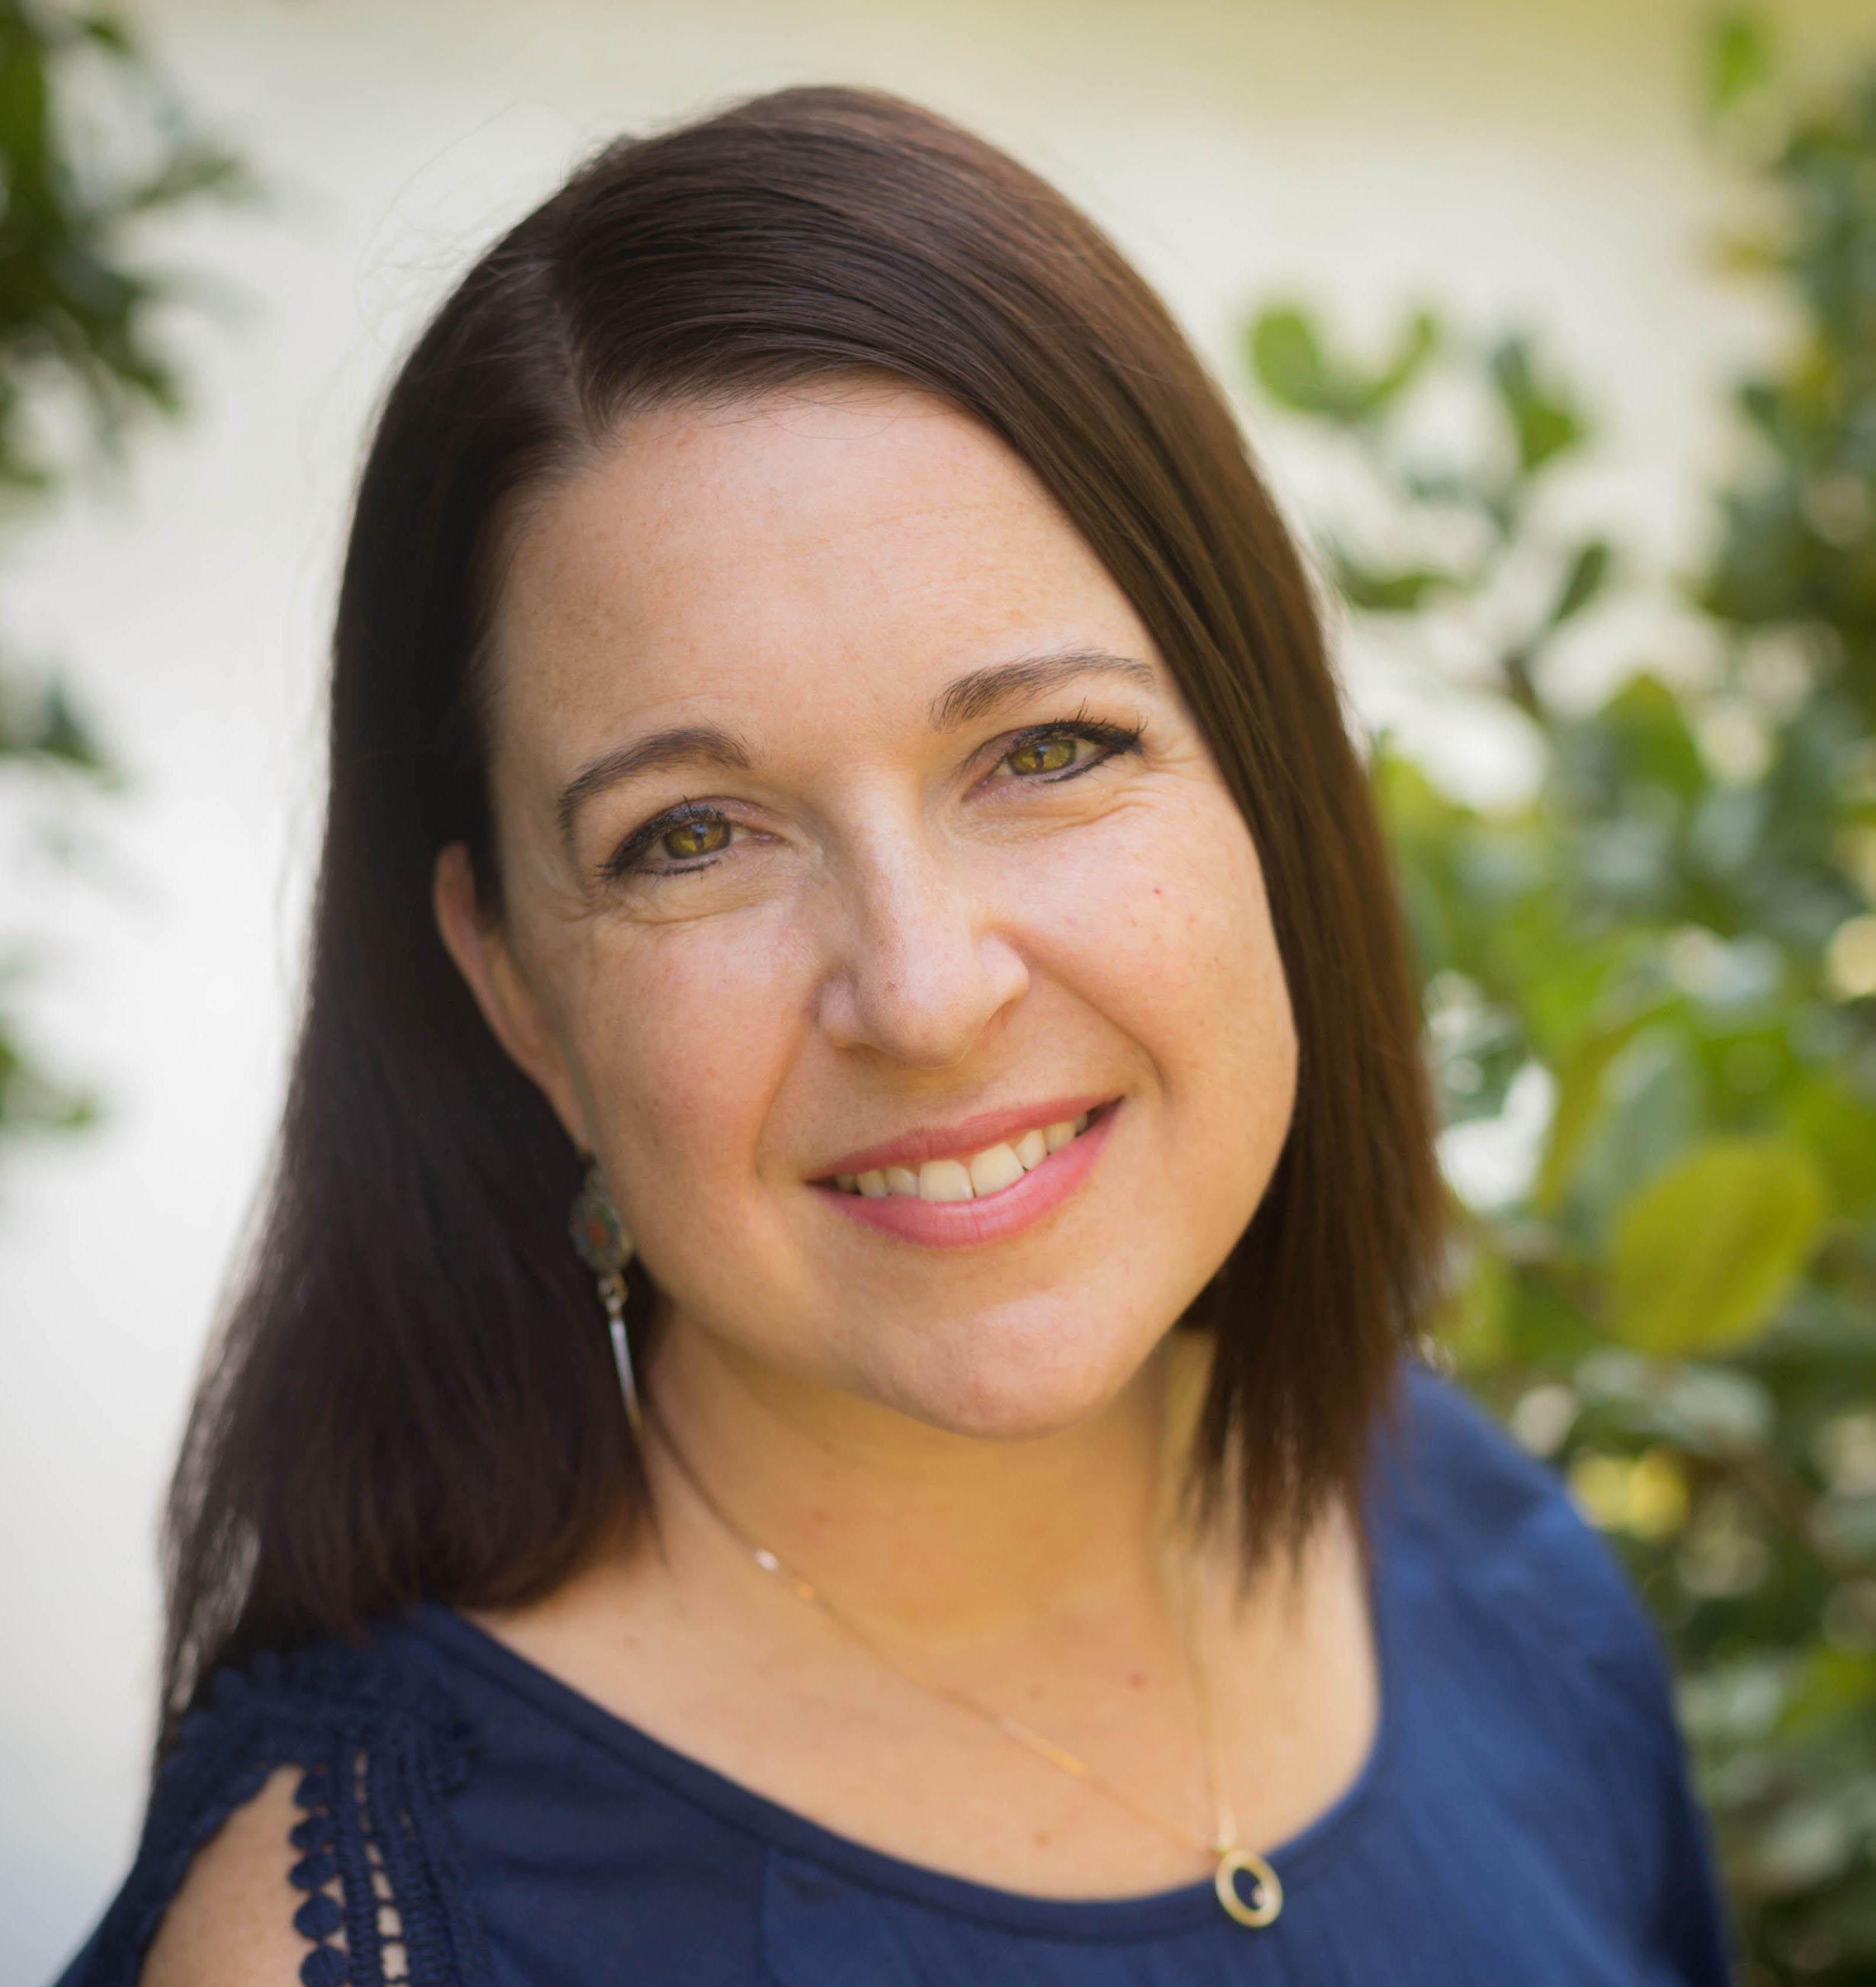 new headshot of author Leah Lively